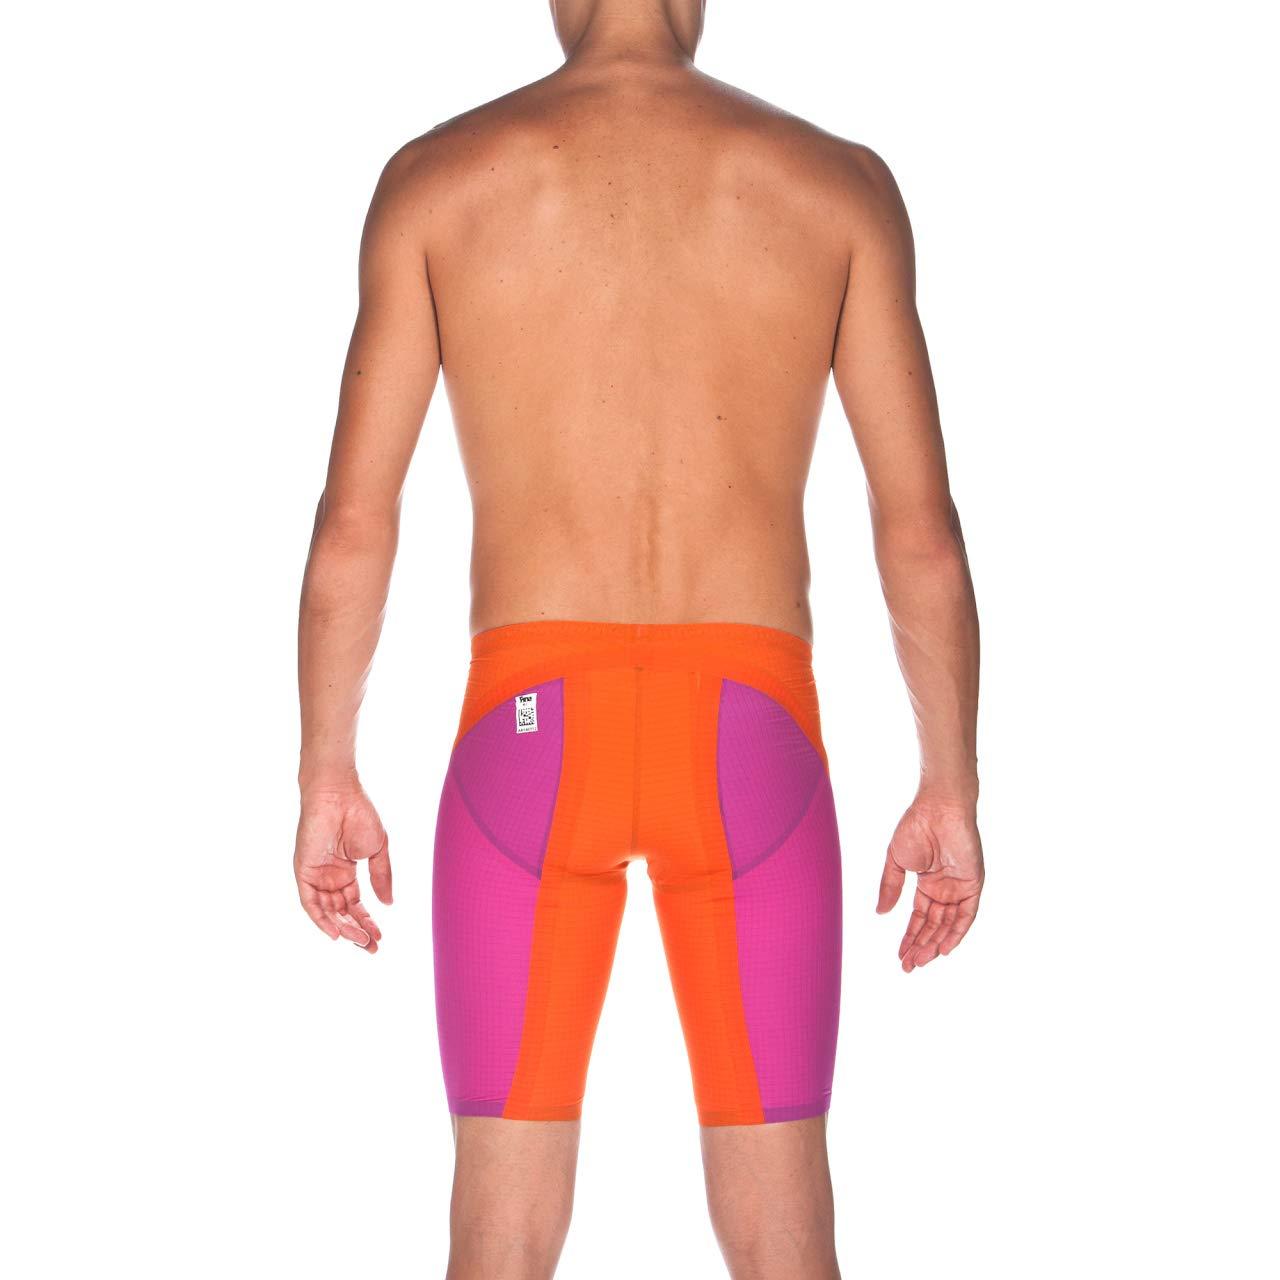 arena Powerskin Carbon Flex VX Jammer Mens Racing Swimsuit